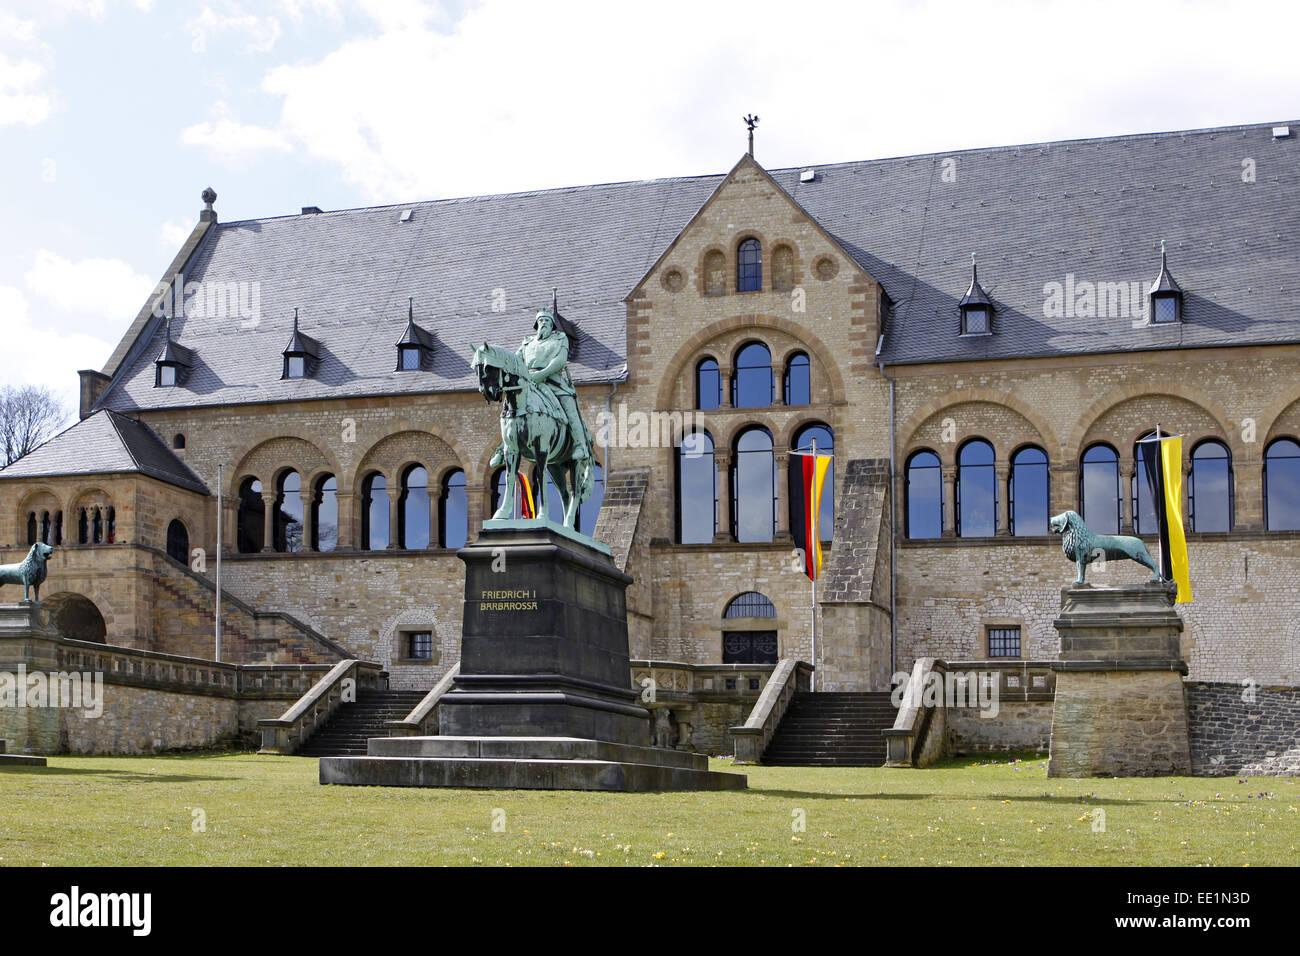 Altstadt, Architektur, Bauwerk, Bauwerke, Deutschland, Fassade, Fassaden, Gebaeude, Goslar, Kaiser, Kaiserpfalz, Stock Photo